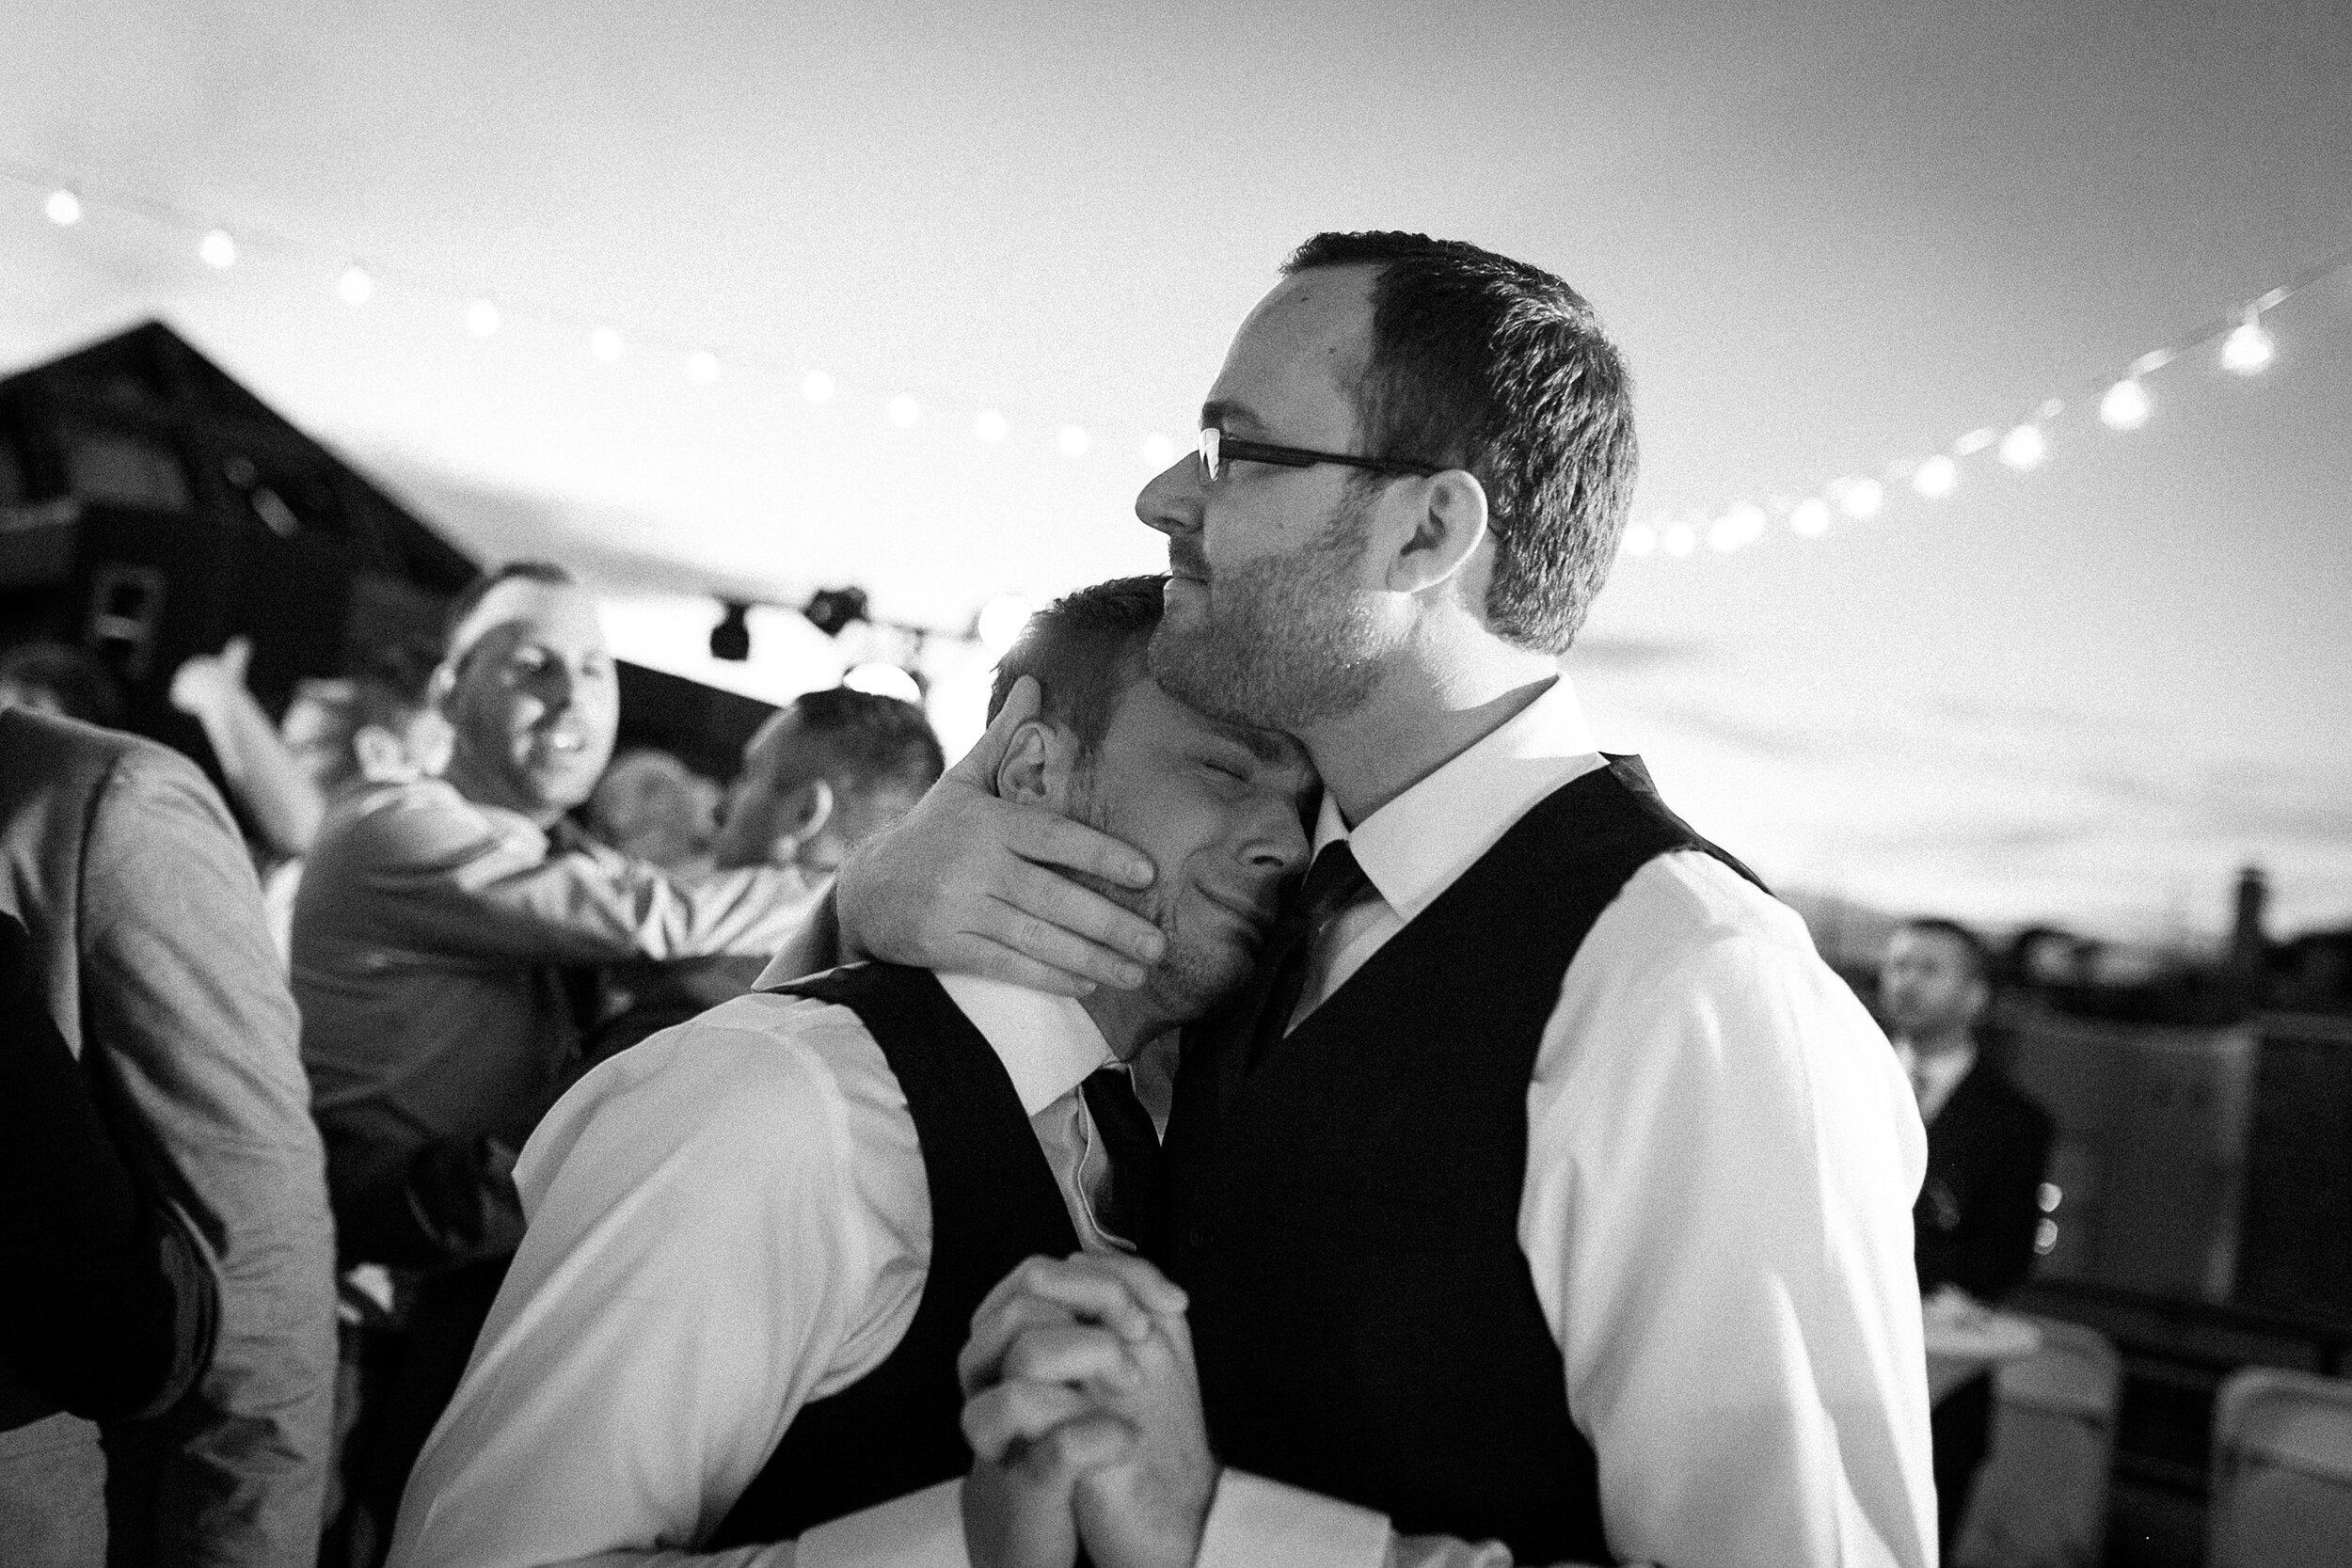 lincoln-park-chicago-same-sex-travel-themed-rooftop-documentary-wedding-photography-by-oriana-koren-okrfoto-060.jpg